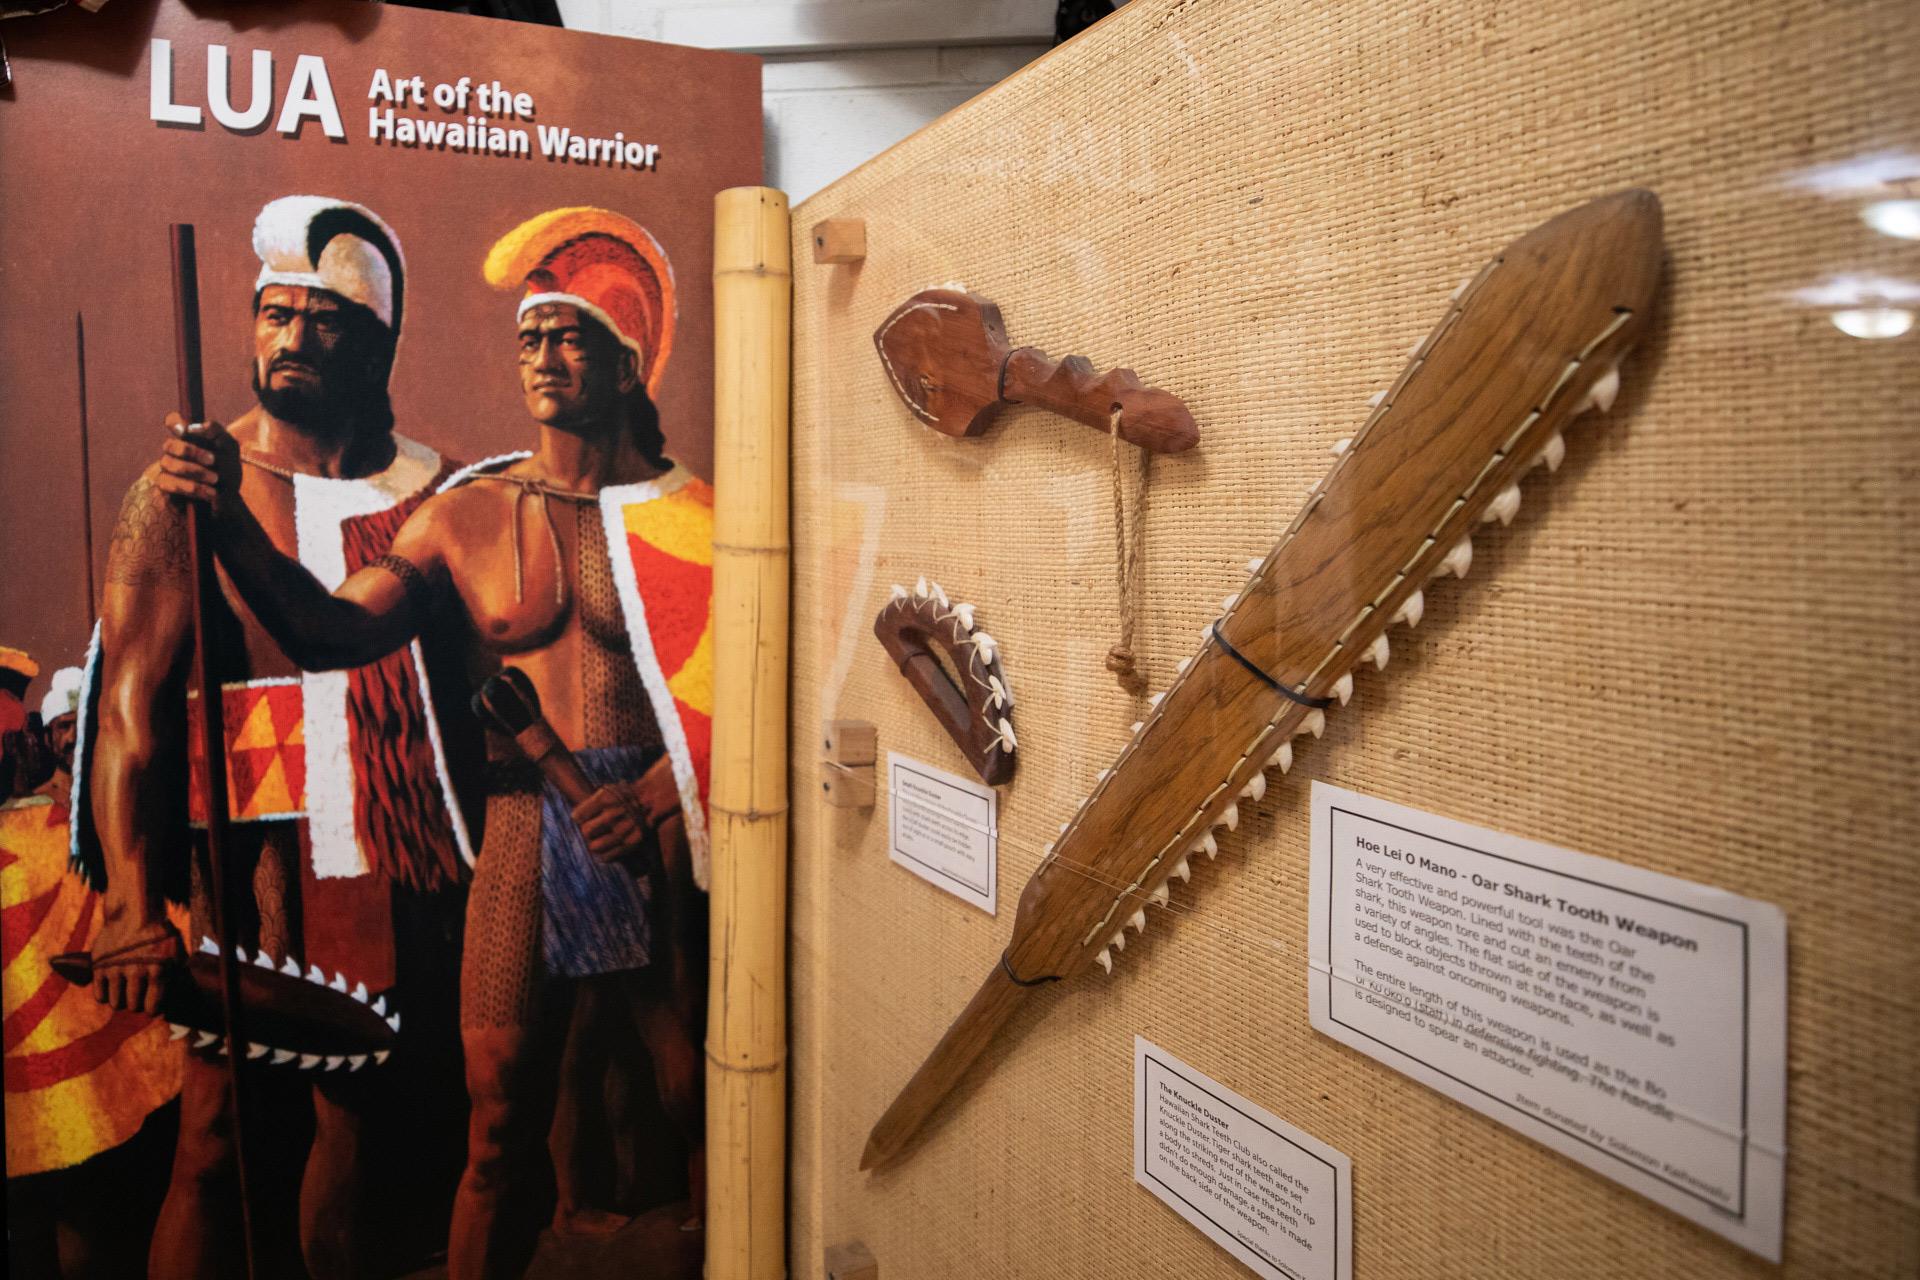 history-close-to-home-5-martial-arts-history-museum-hawaiian-arts-exhibit